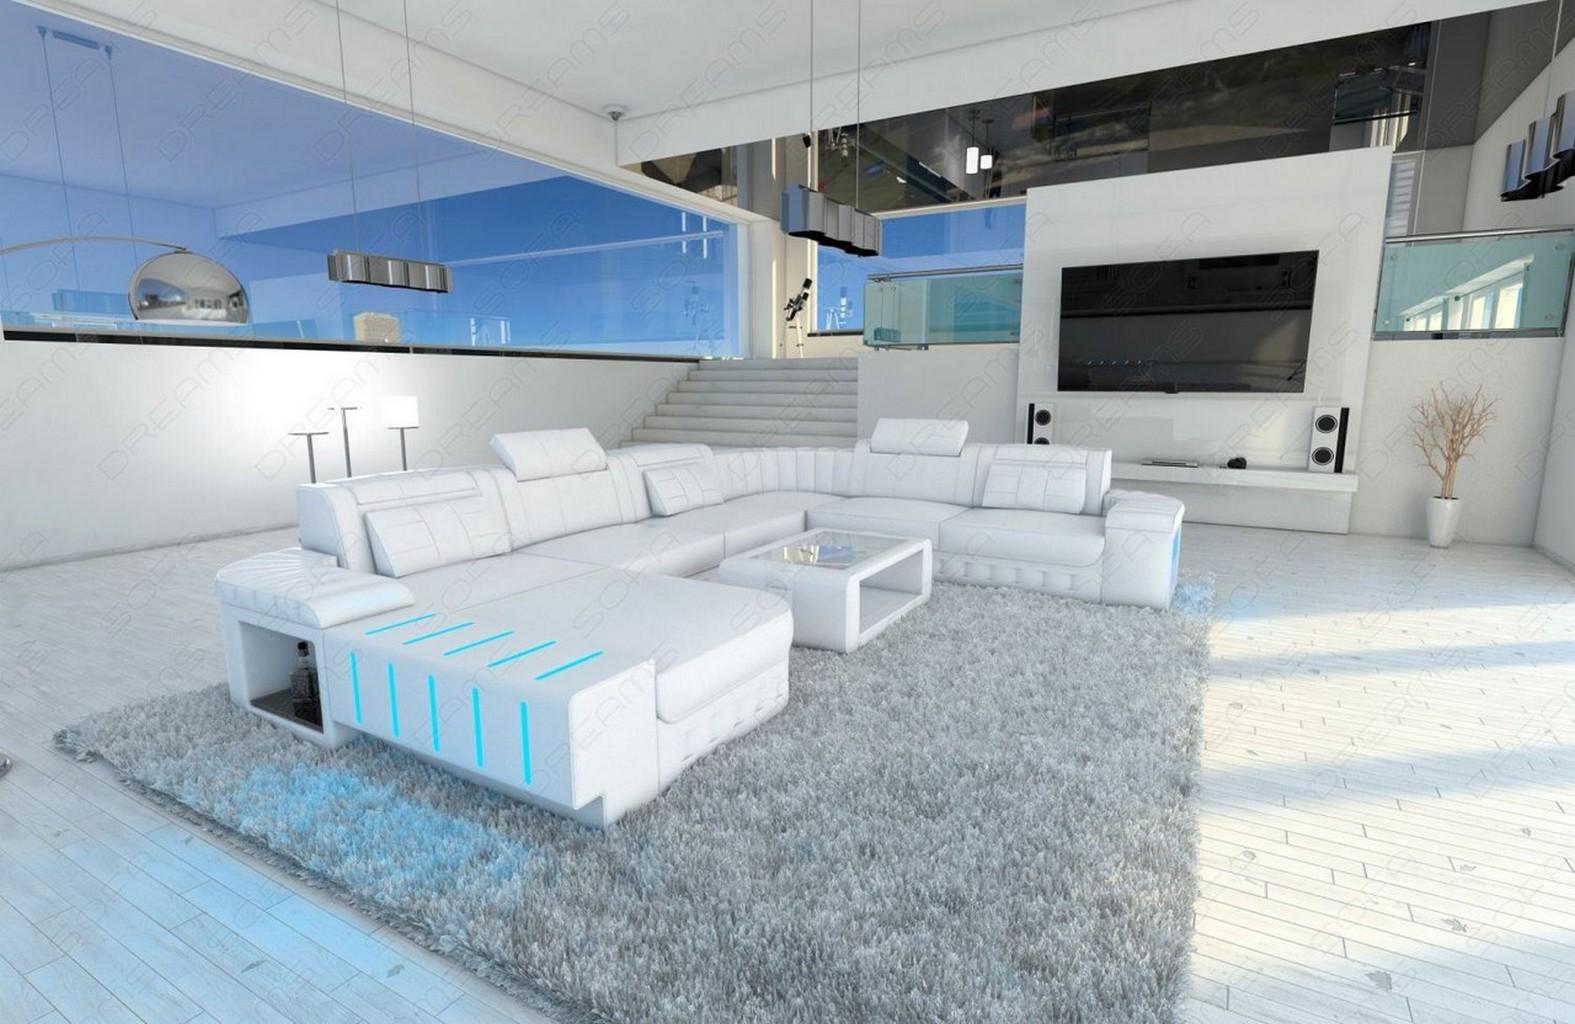 Sofa Leder Wohnlandschaft Bellagio Xxl Designsofa Weiss Ottomane Led